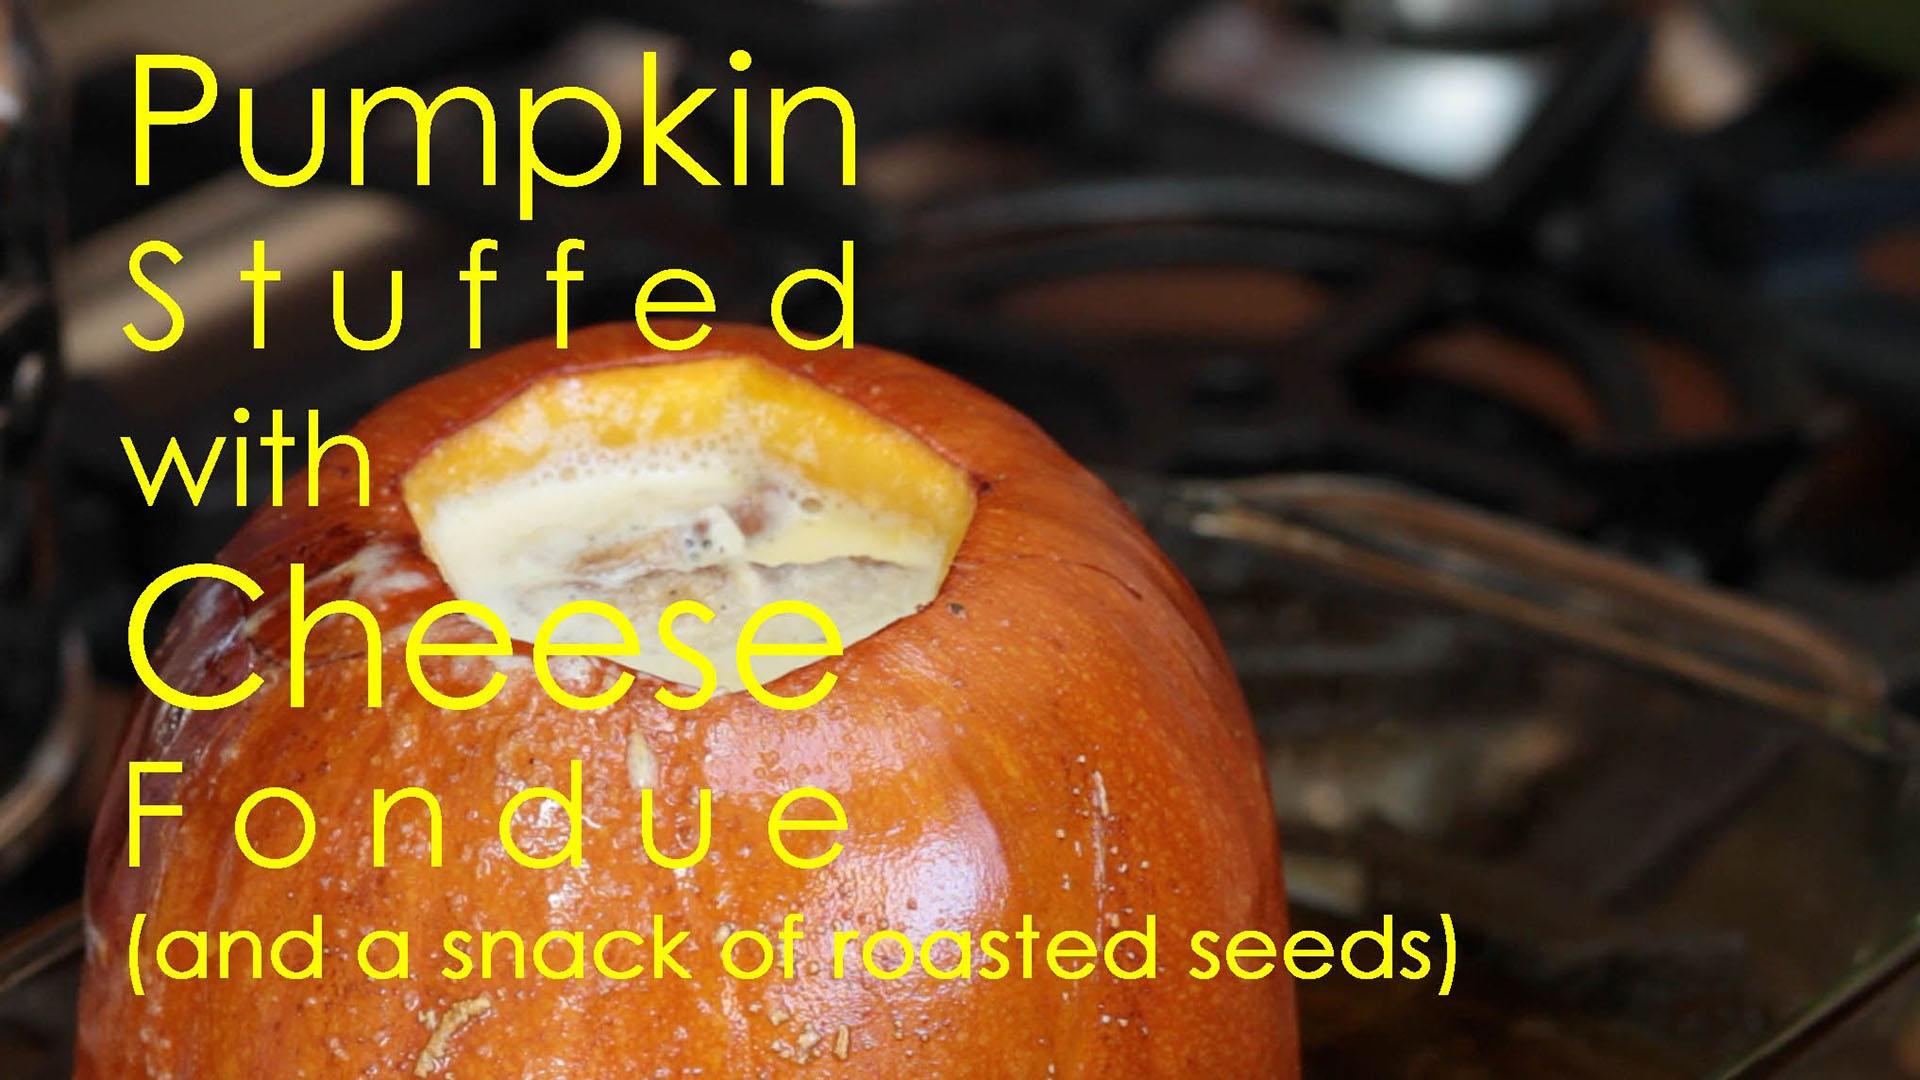 Pumpkin Stuffed with Cheese Fondue